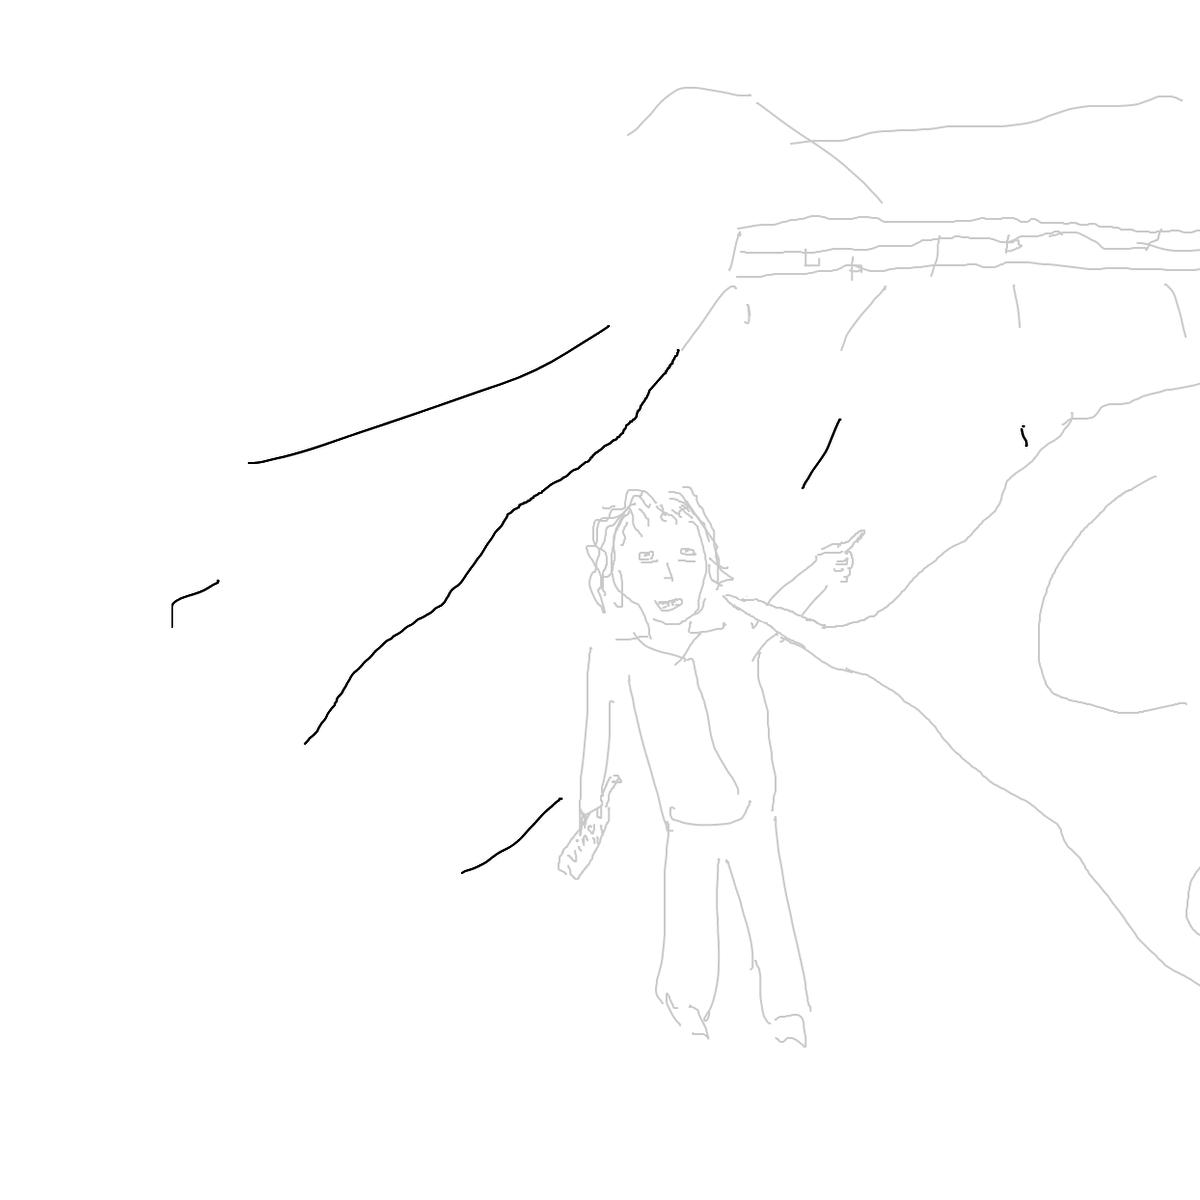 BAAAM drawing#9335 lat:41.7283706665039060lng: 13.2908248901367190